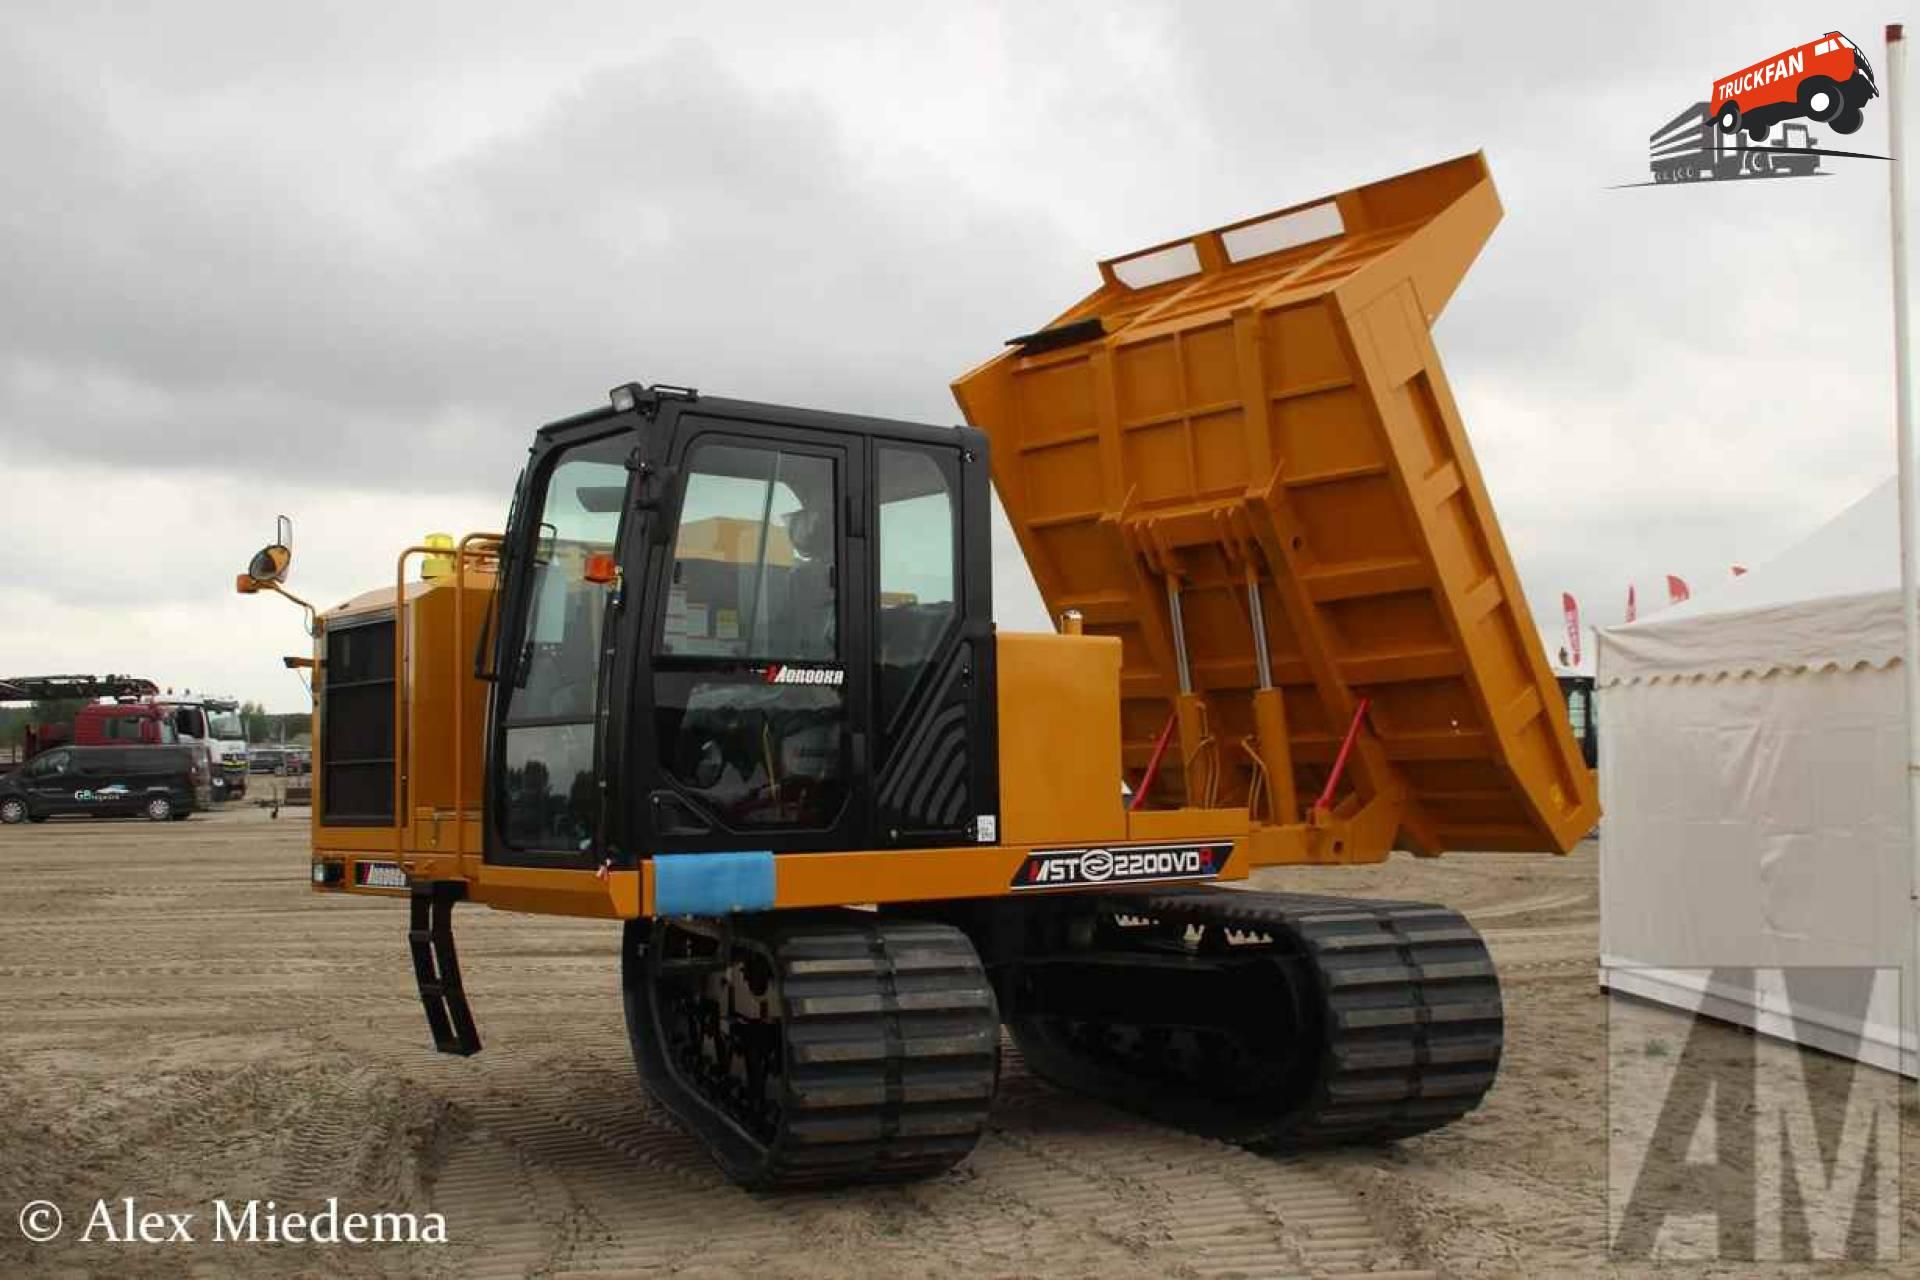 Morooka MST 2200VD